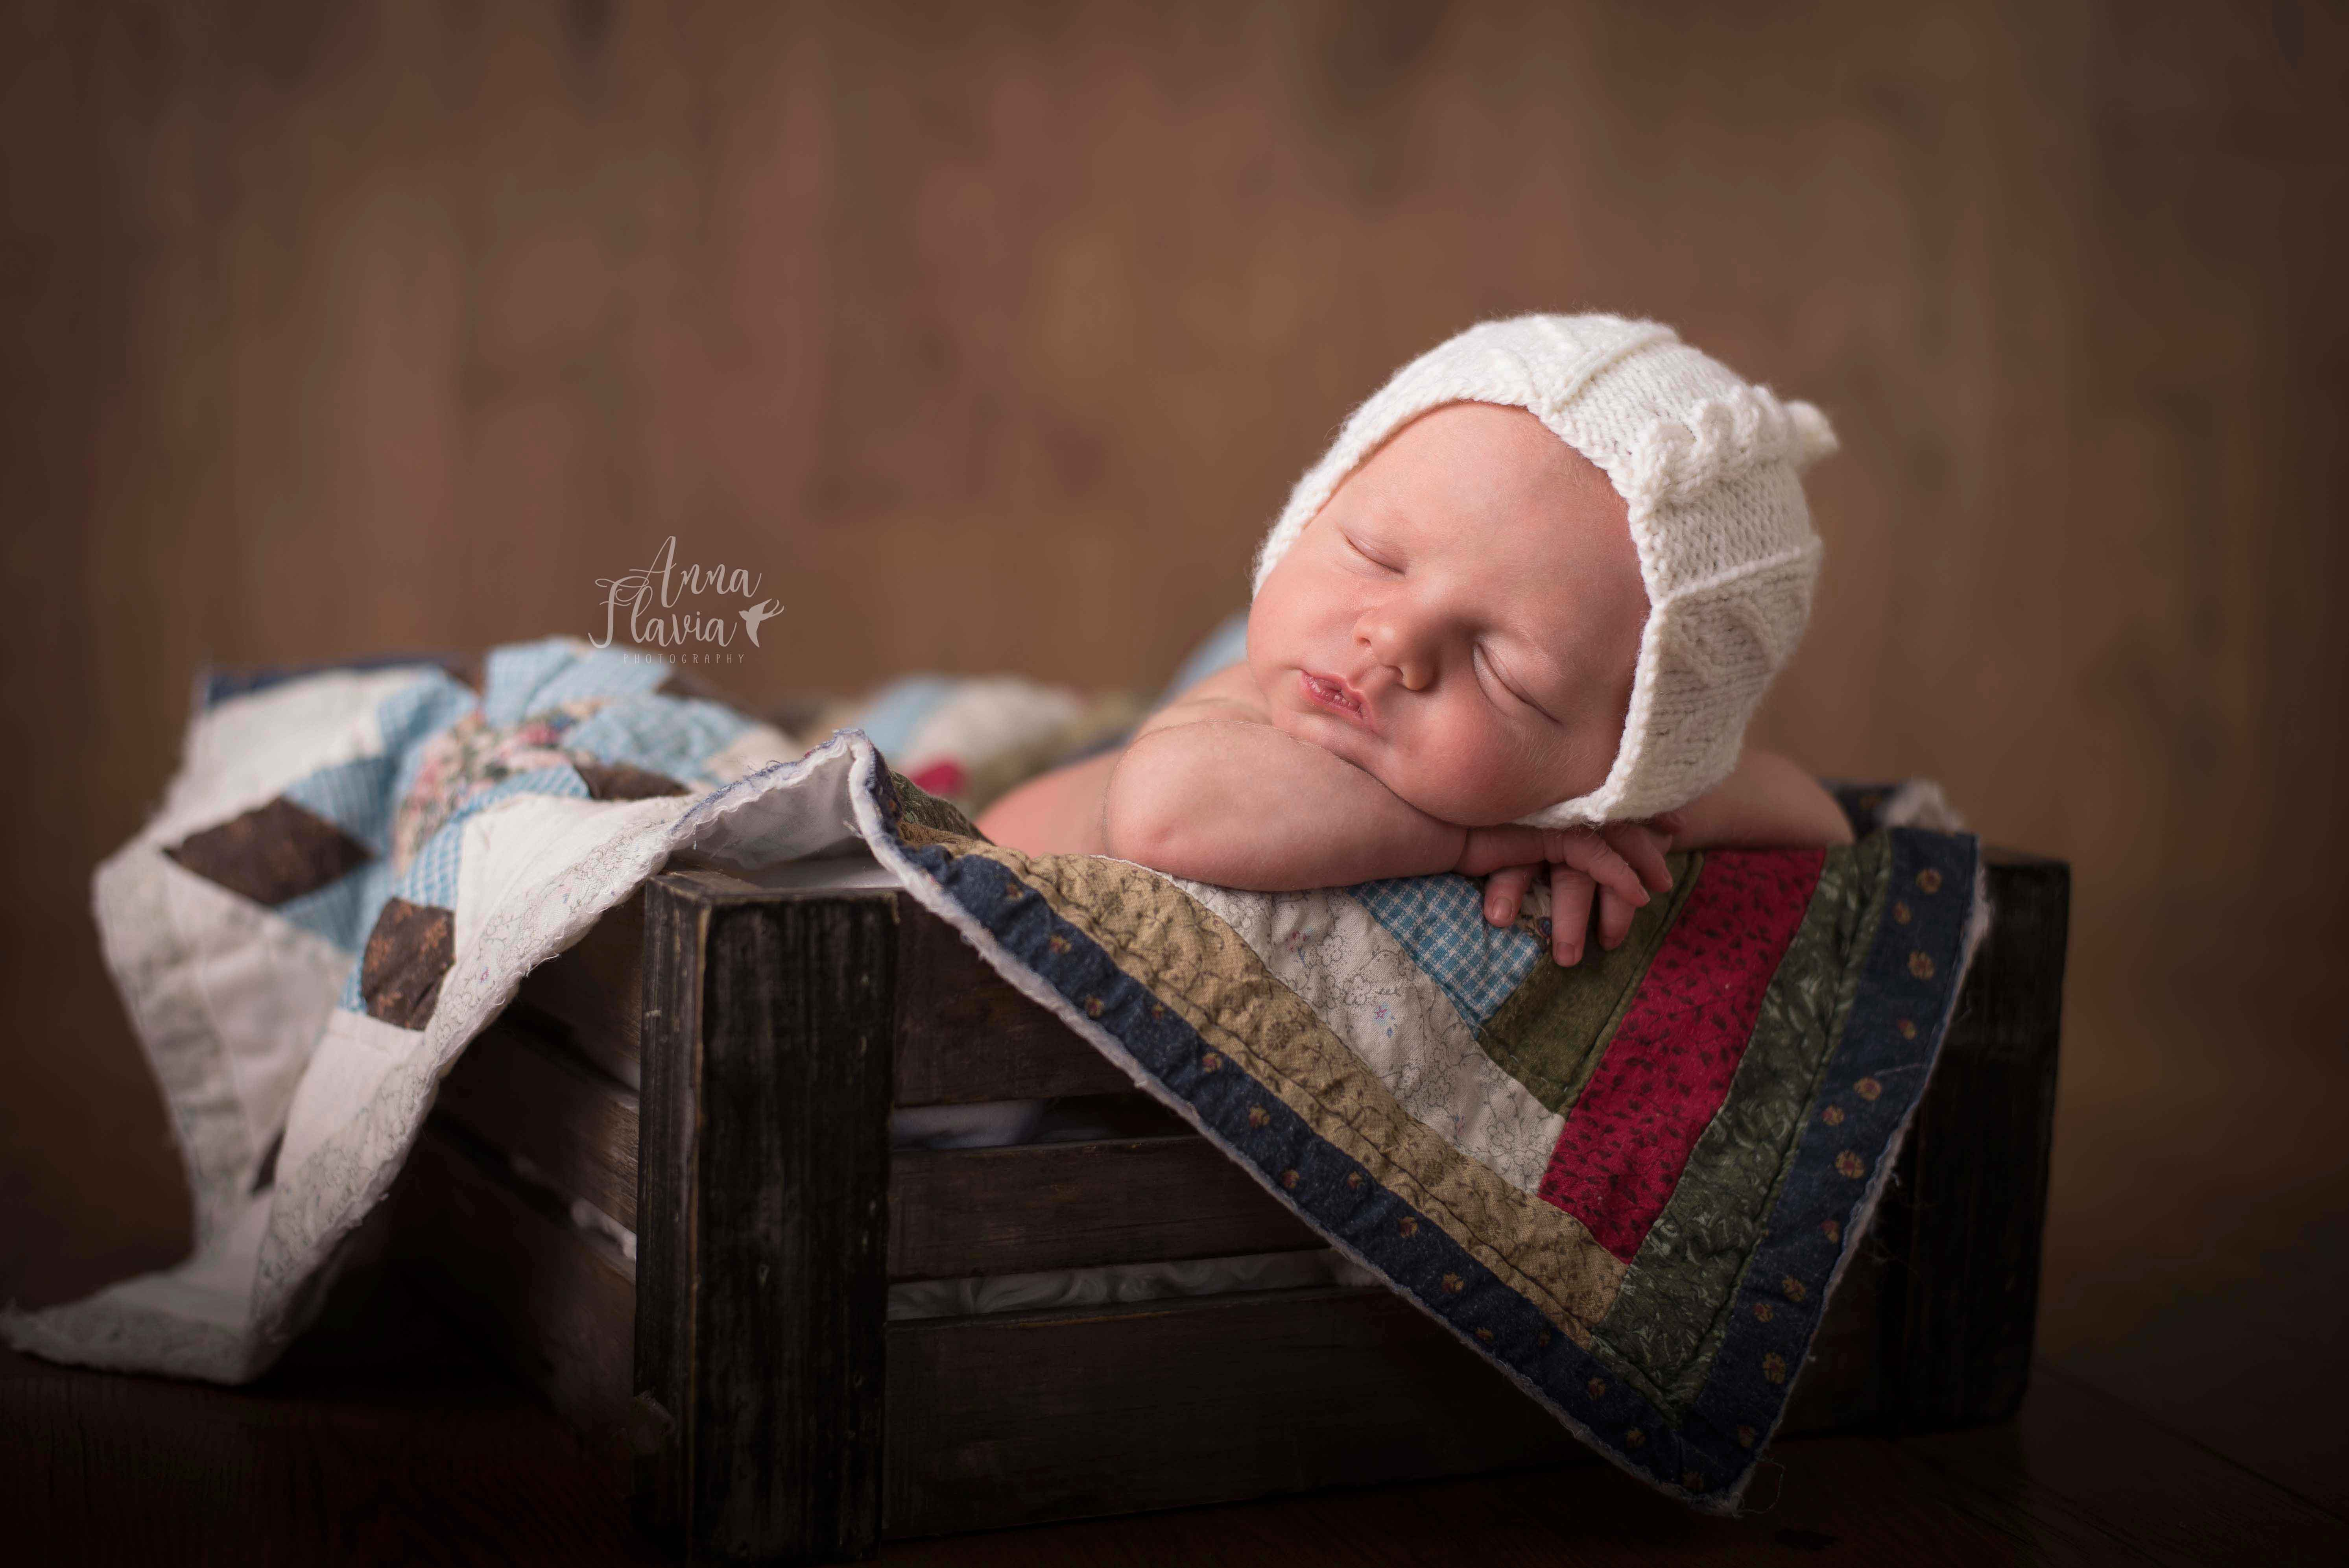 photographer_dublin_anna_flavia_newborn_maternity_26